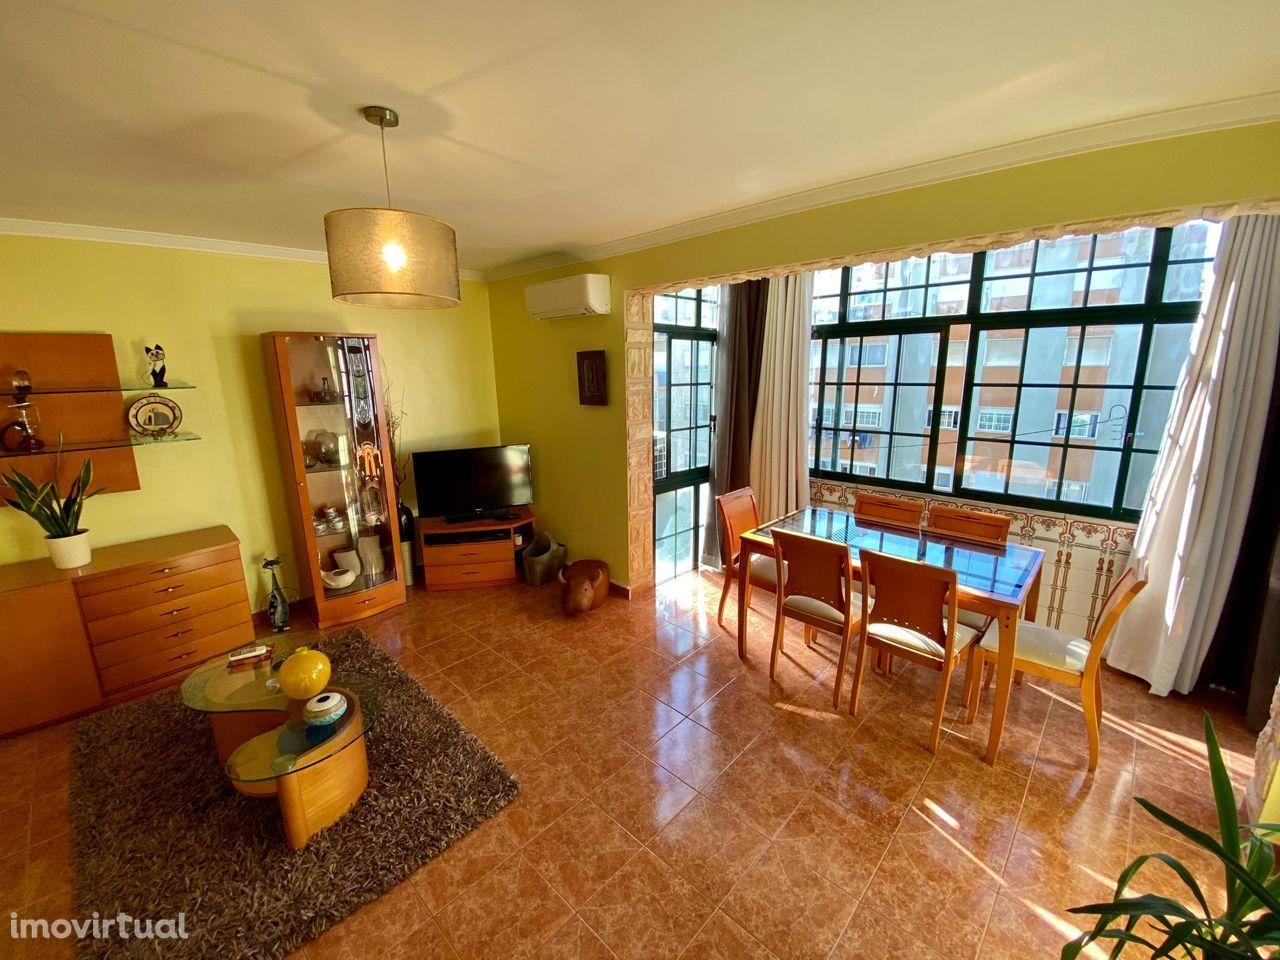 Apartamento T3 na Quinta do Rouxinol, Corroios.